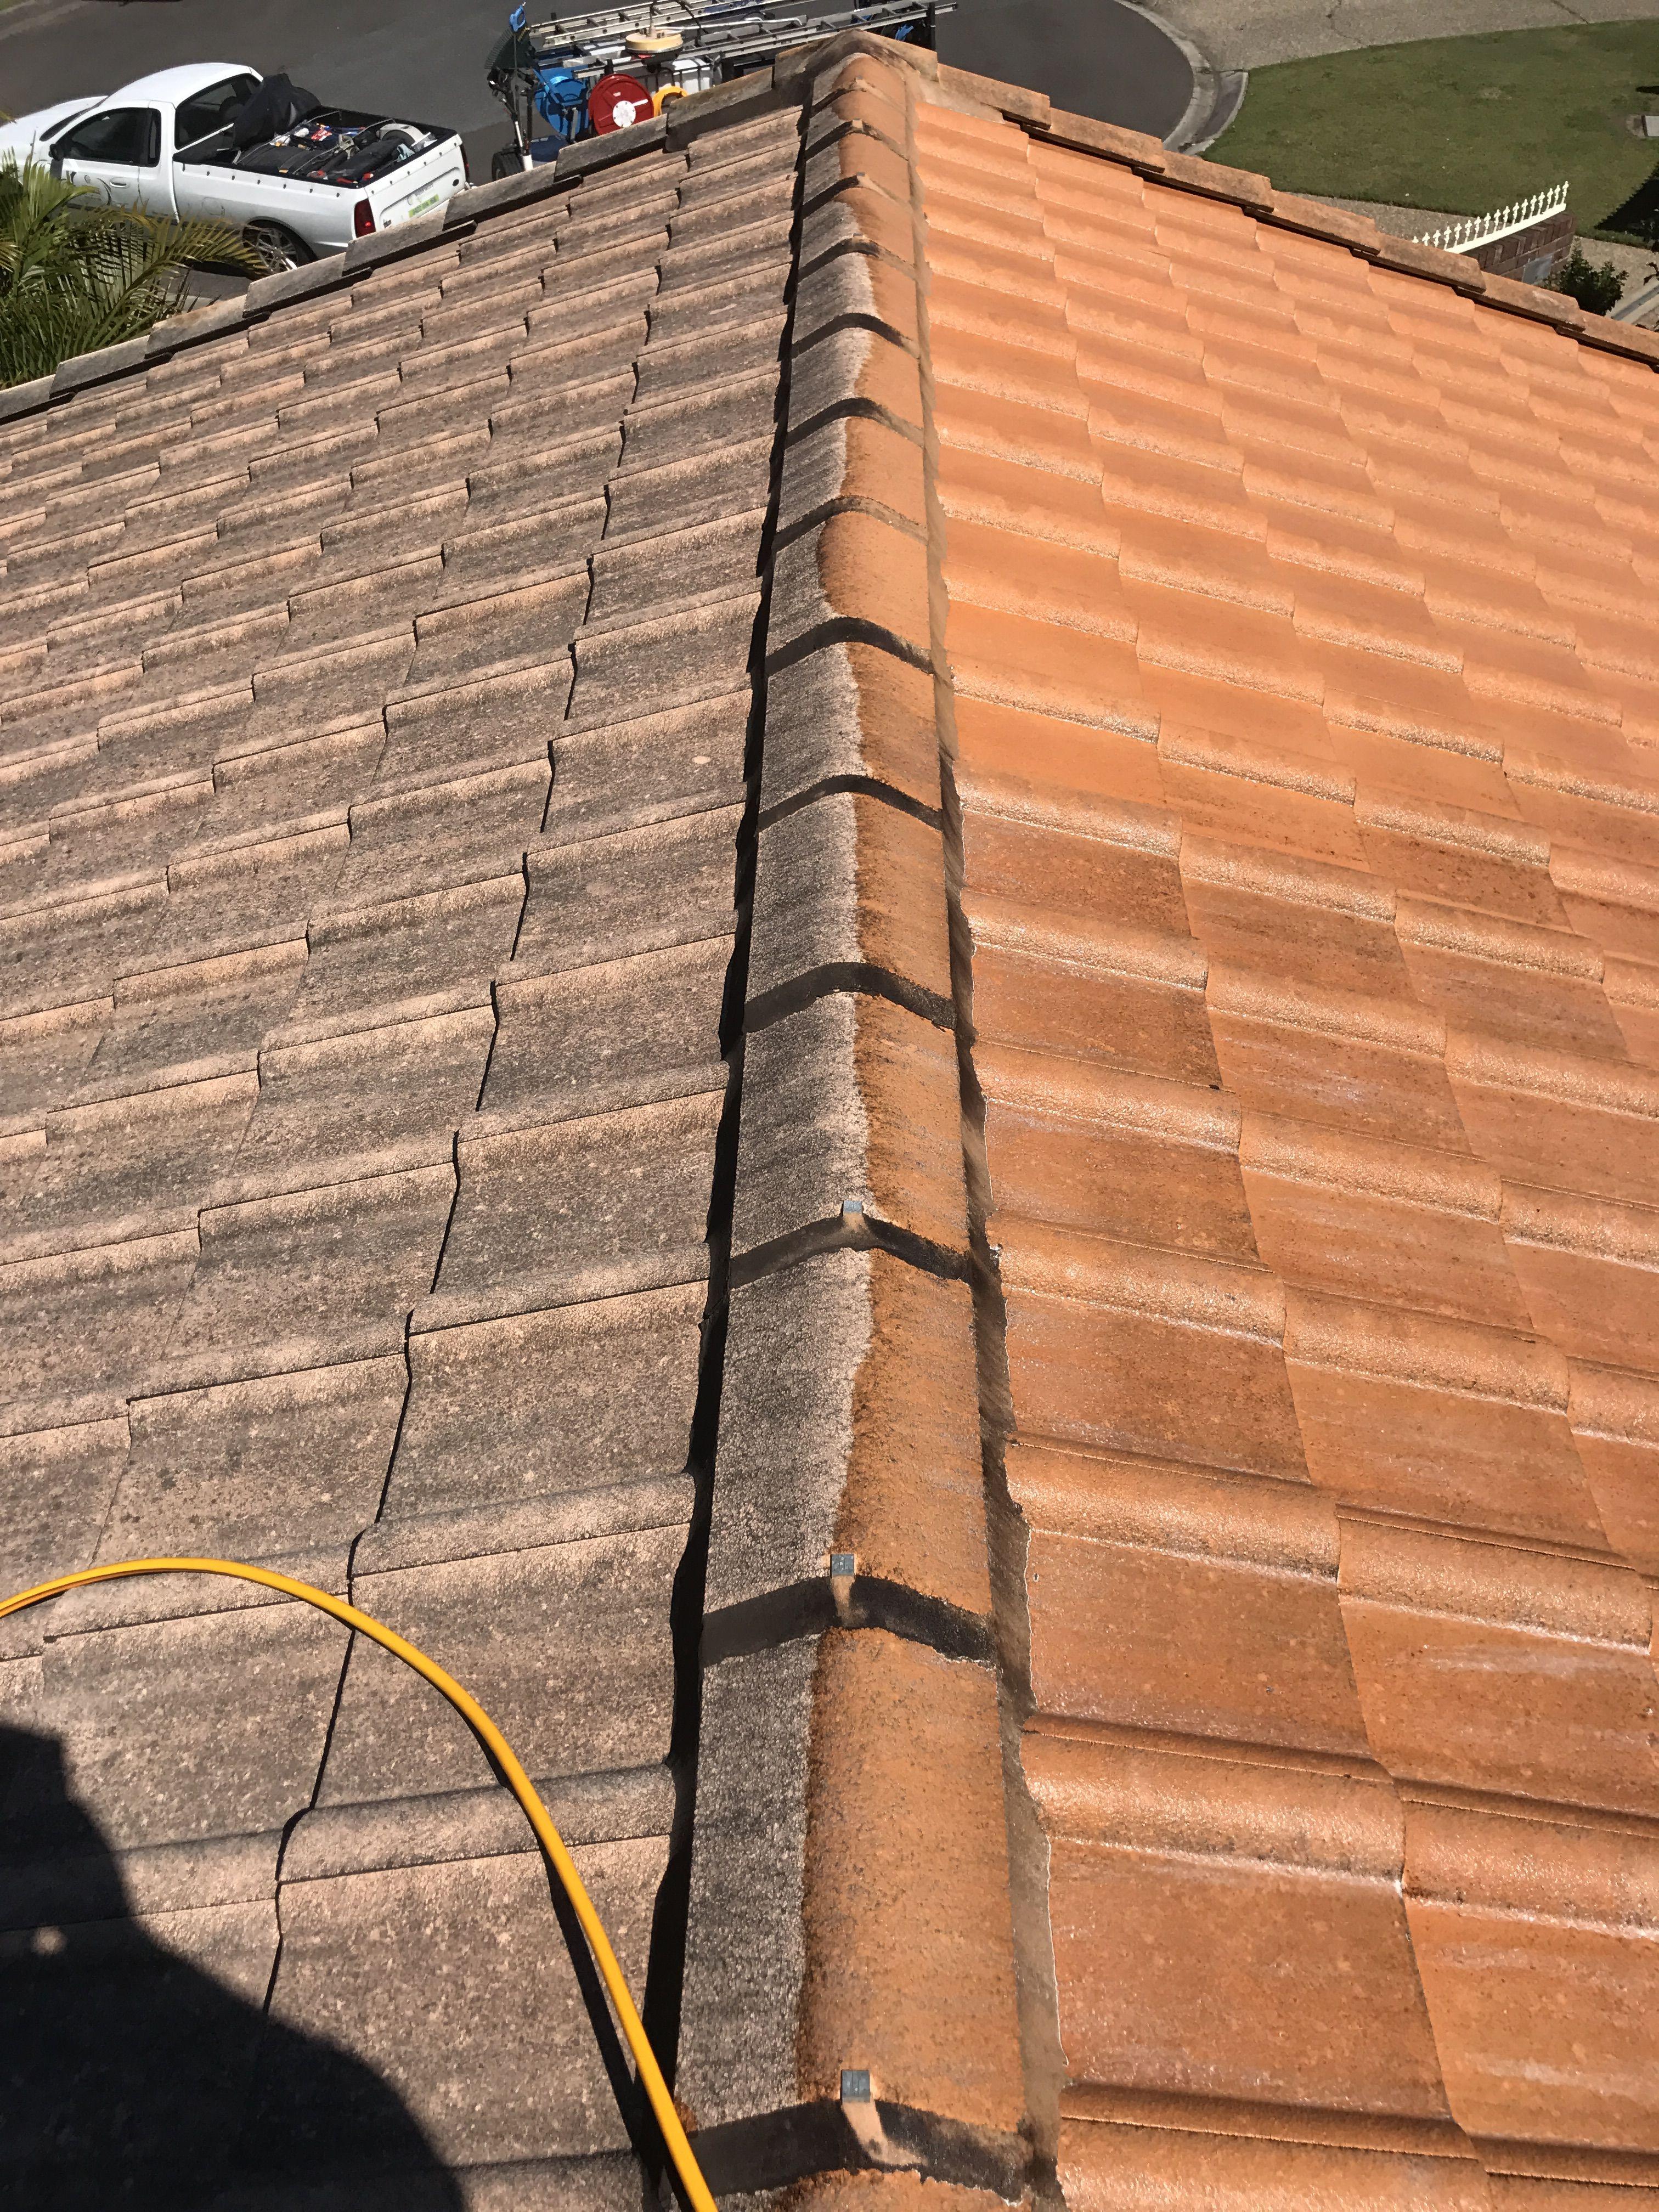 Soft Wash Roof No Pressure By Waterworx Roof Cleaning Ipswich Pressure Washing